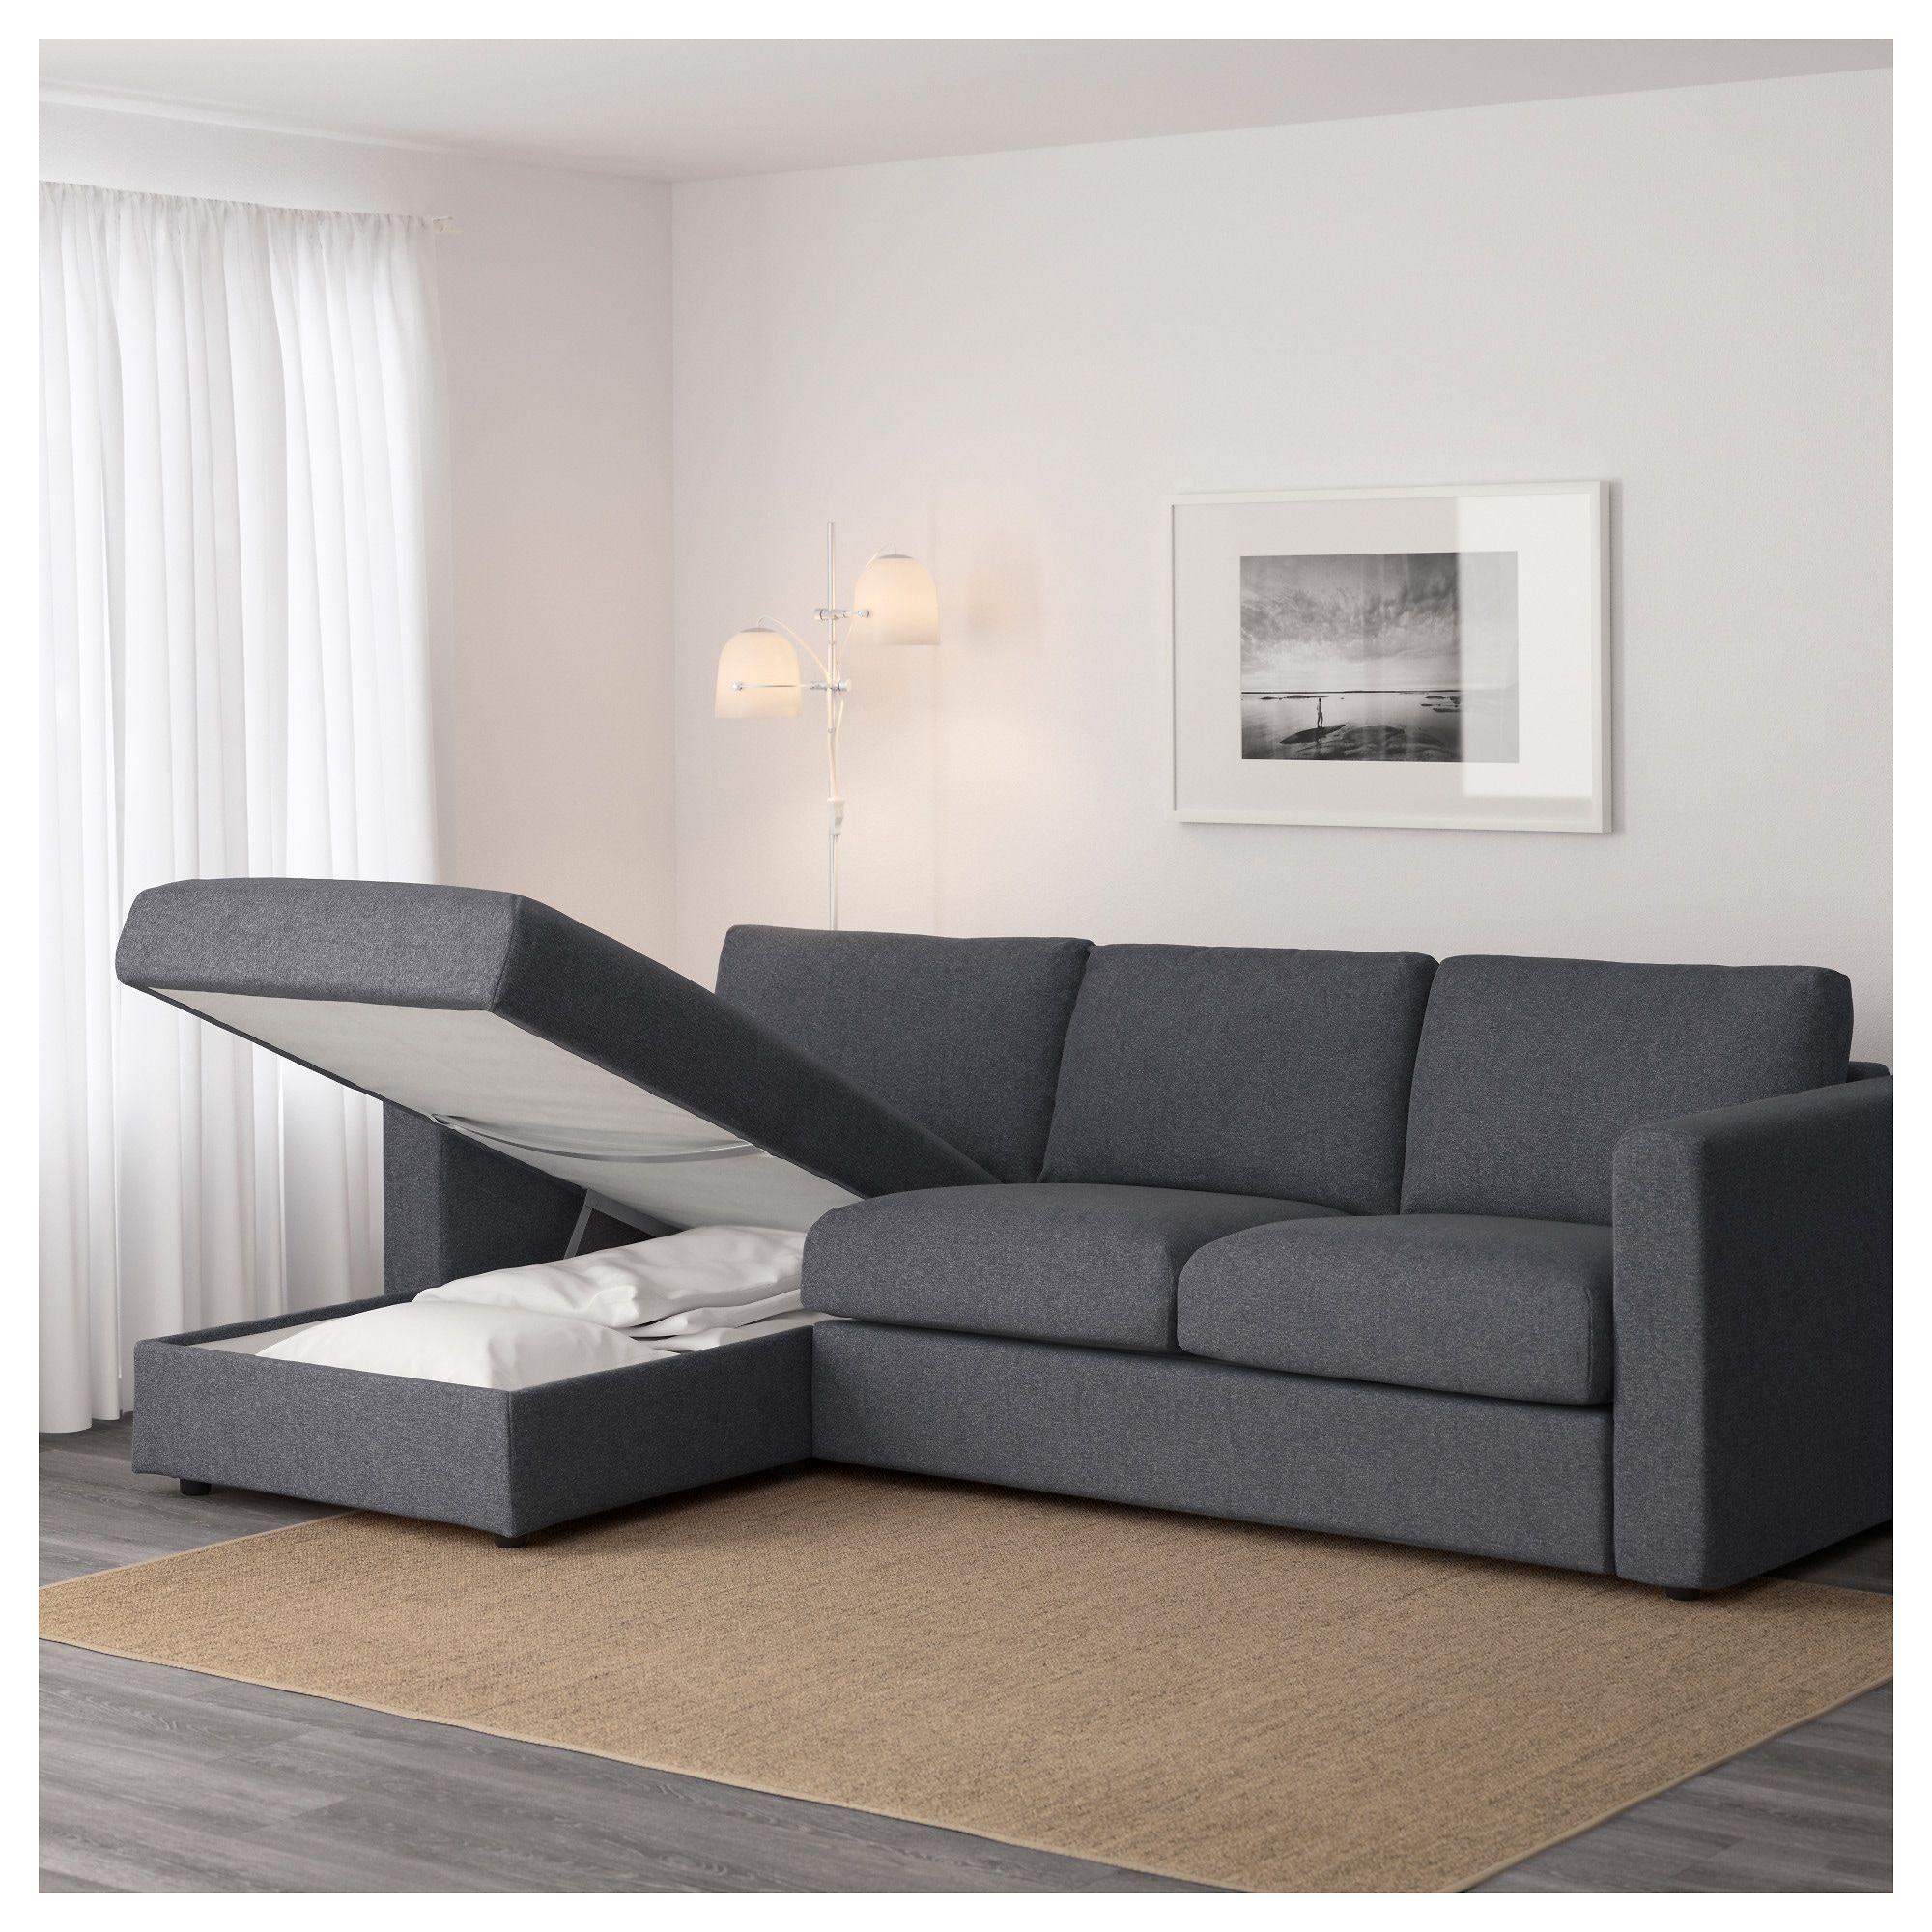 Shop For Furniture Home Accessories More Ikea Vimle Sofa